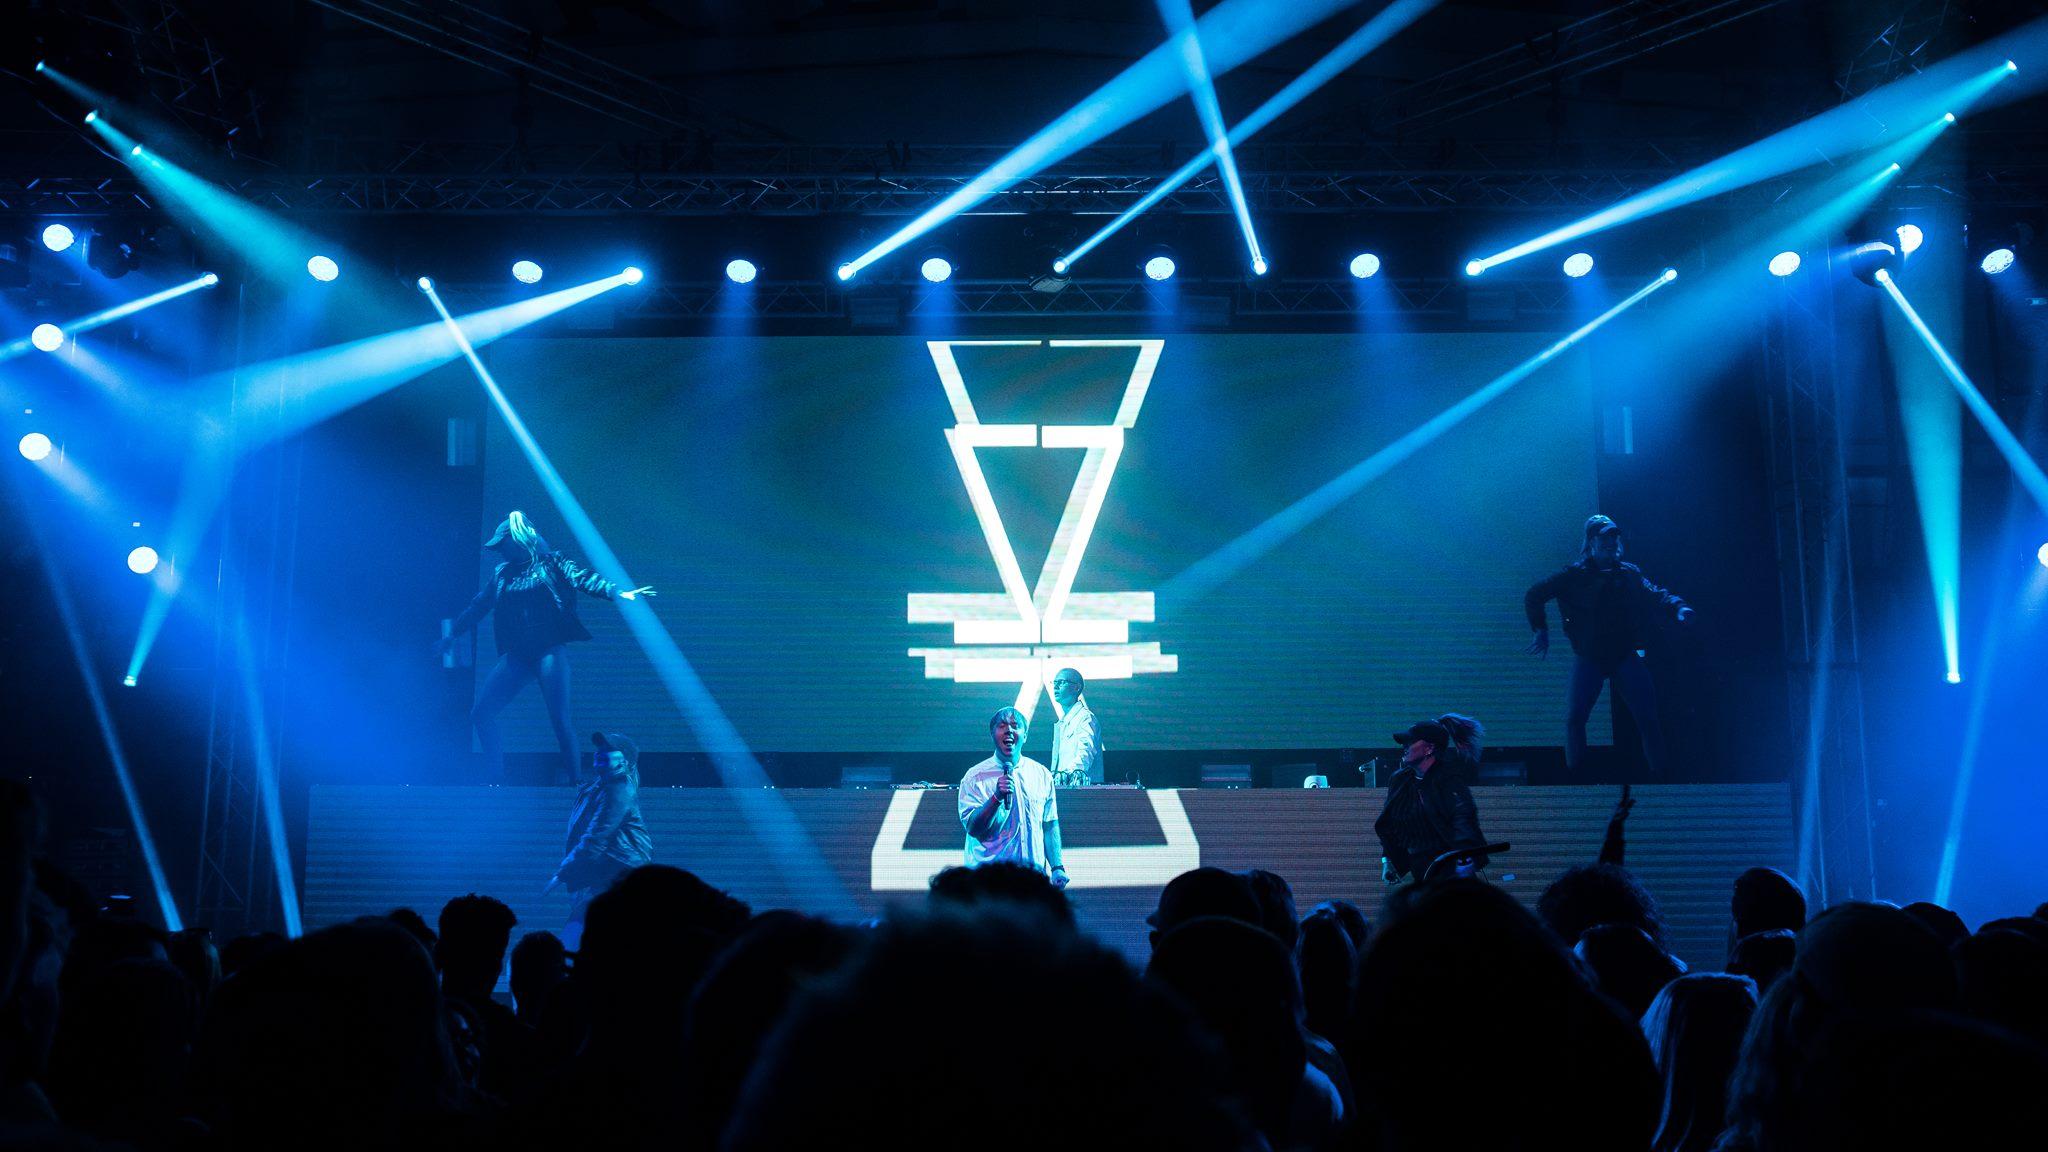 bergz club awards 2018 - empress music management